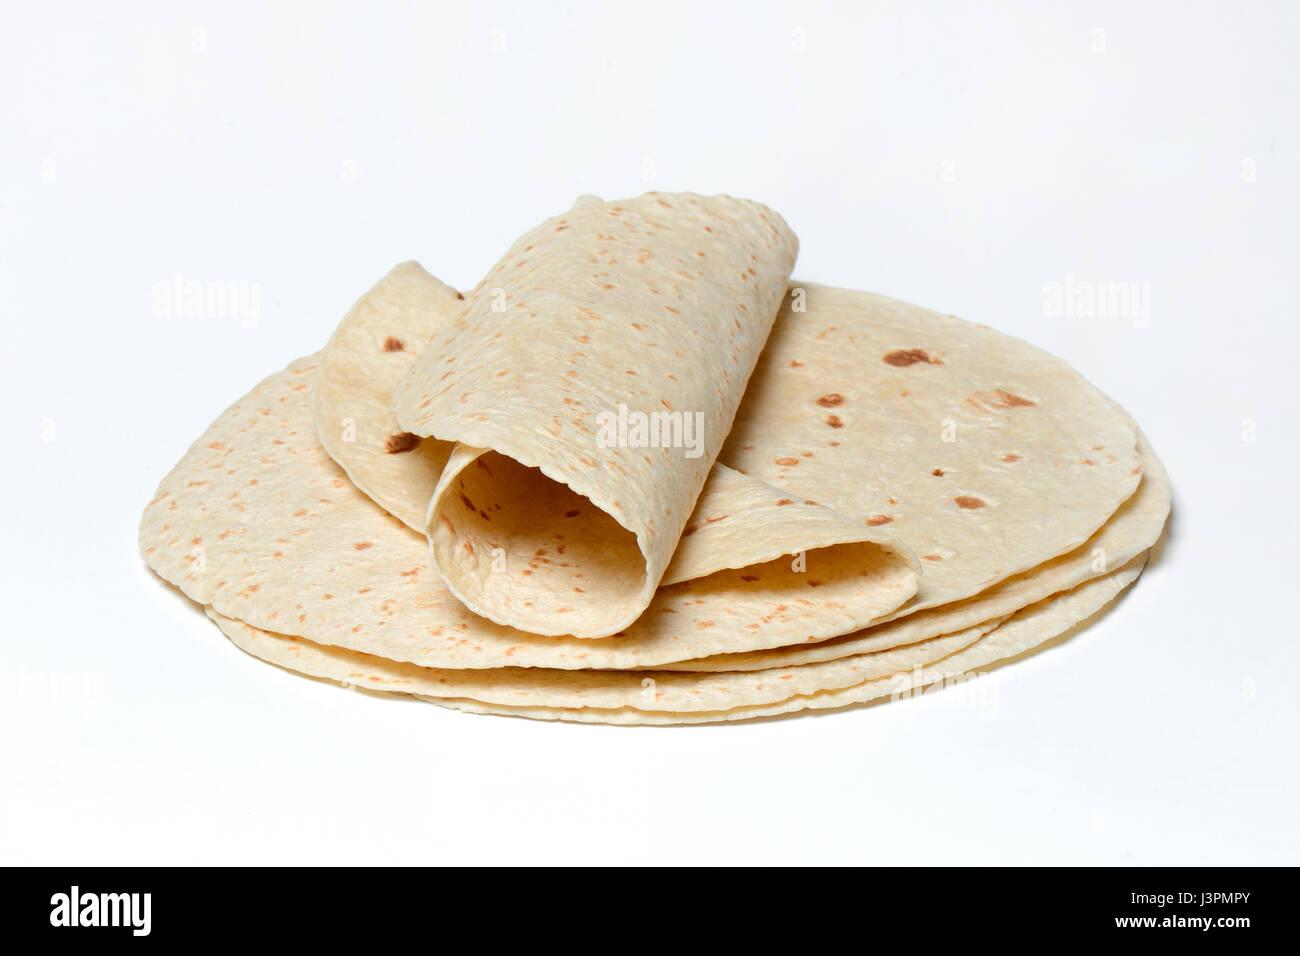 Tortilla, Tortillas, mexikanisch, mexikanische - Stock Image